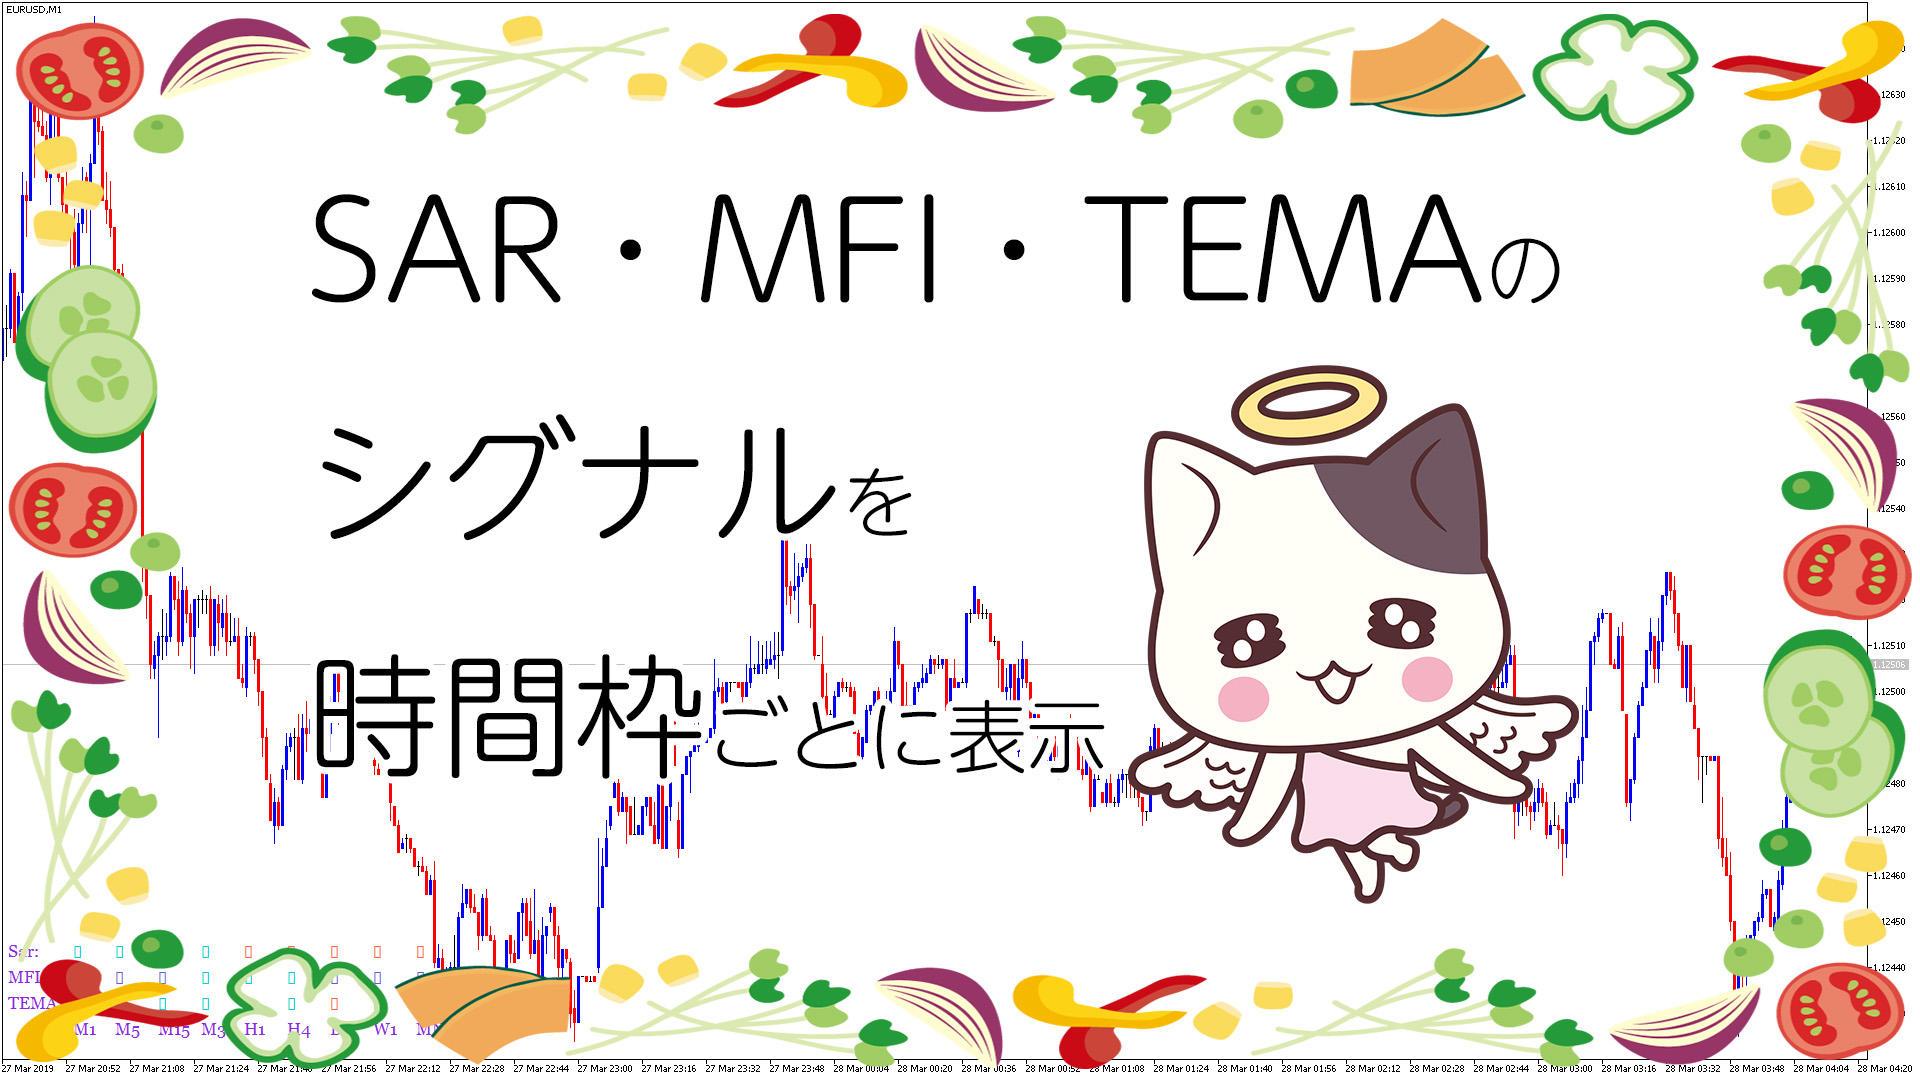 SAR・MFI・TEMAのシグナルを時間枠ごとに表示するMT5インジケータ-「SignalTable_Sar_MFI_TEMA」